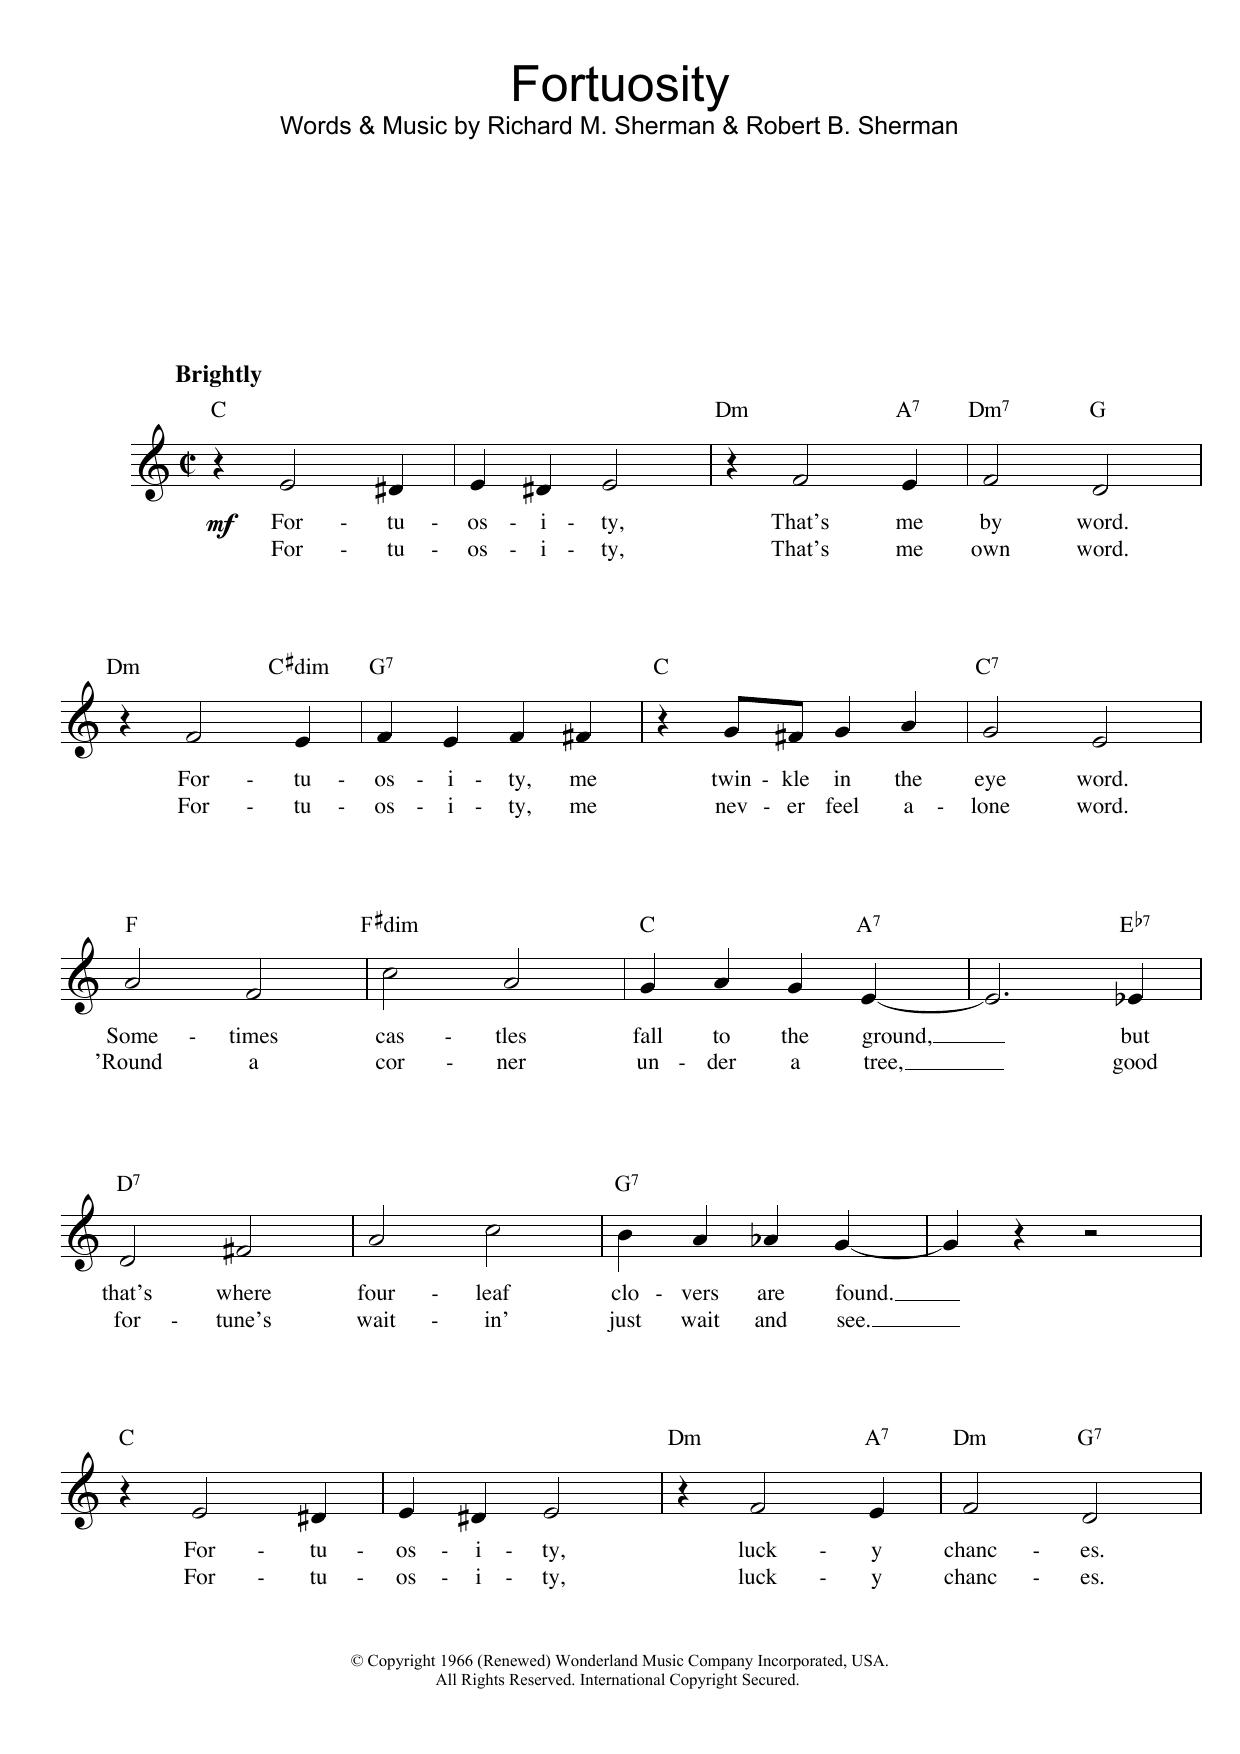 Fortuosity sheet music